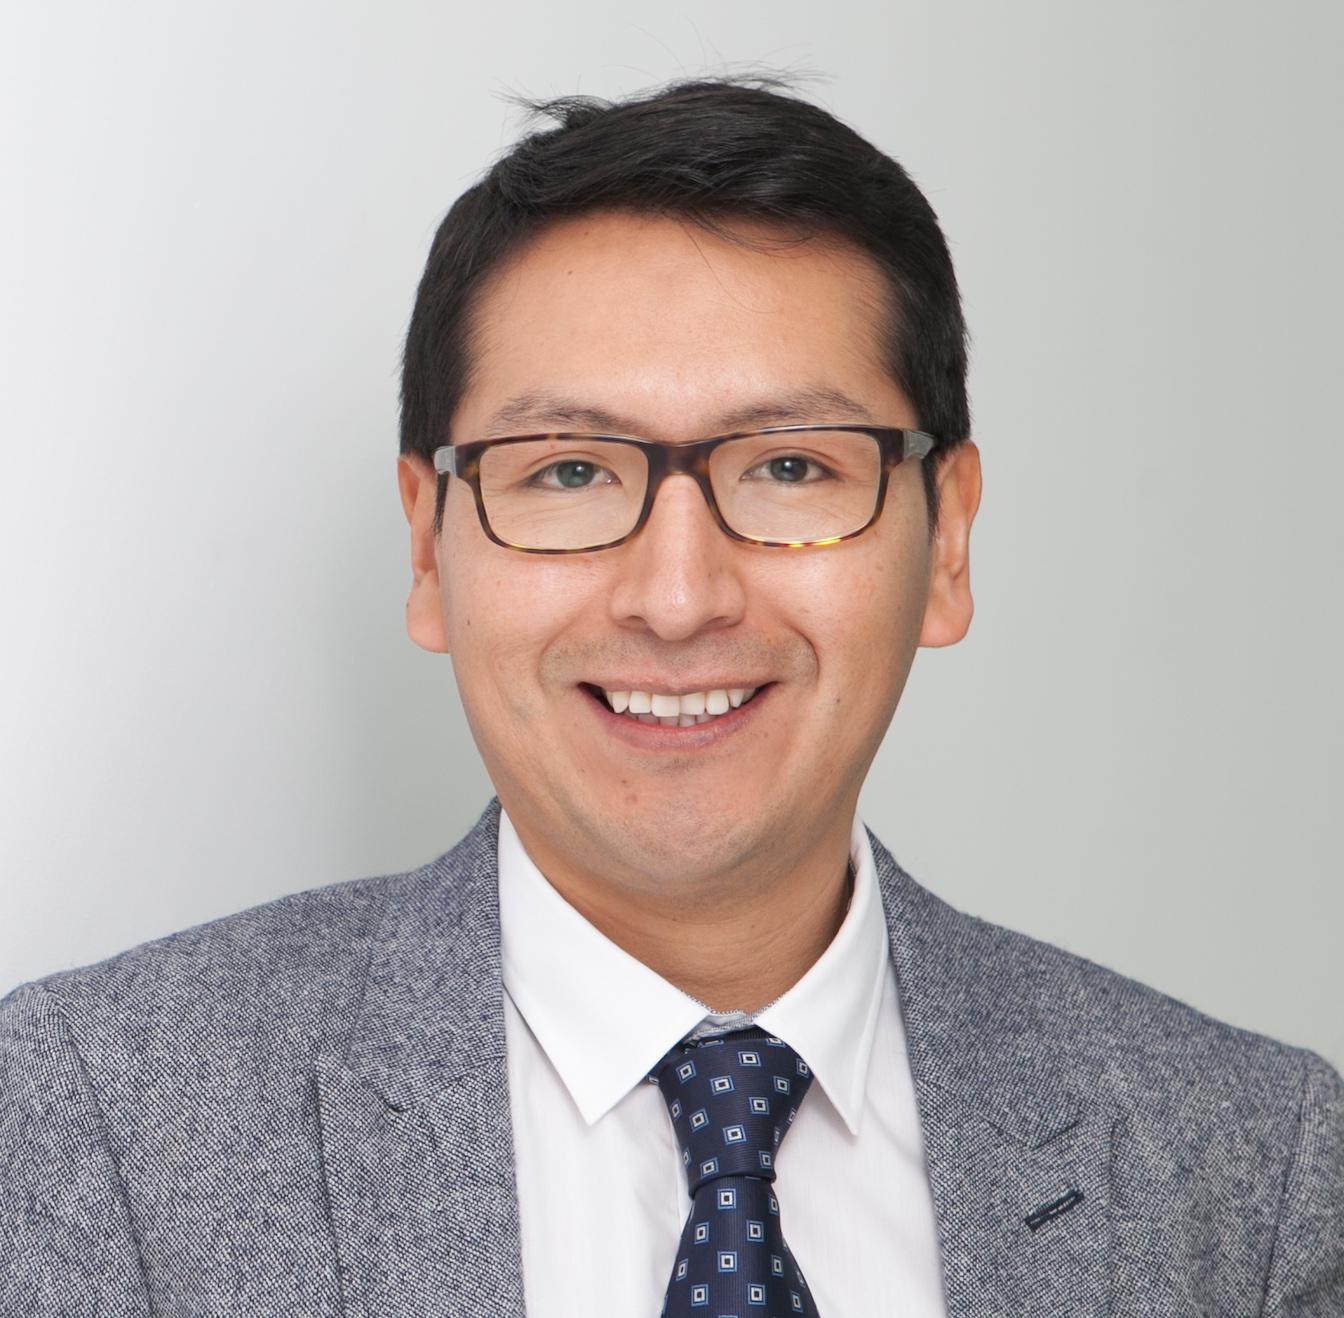 Victor Zevallos Herencia